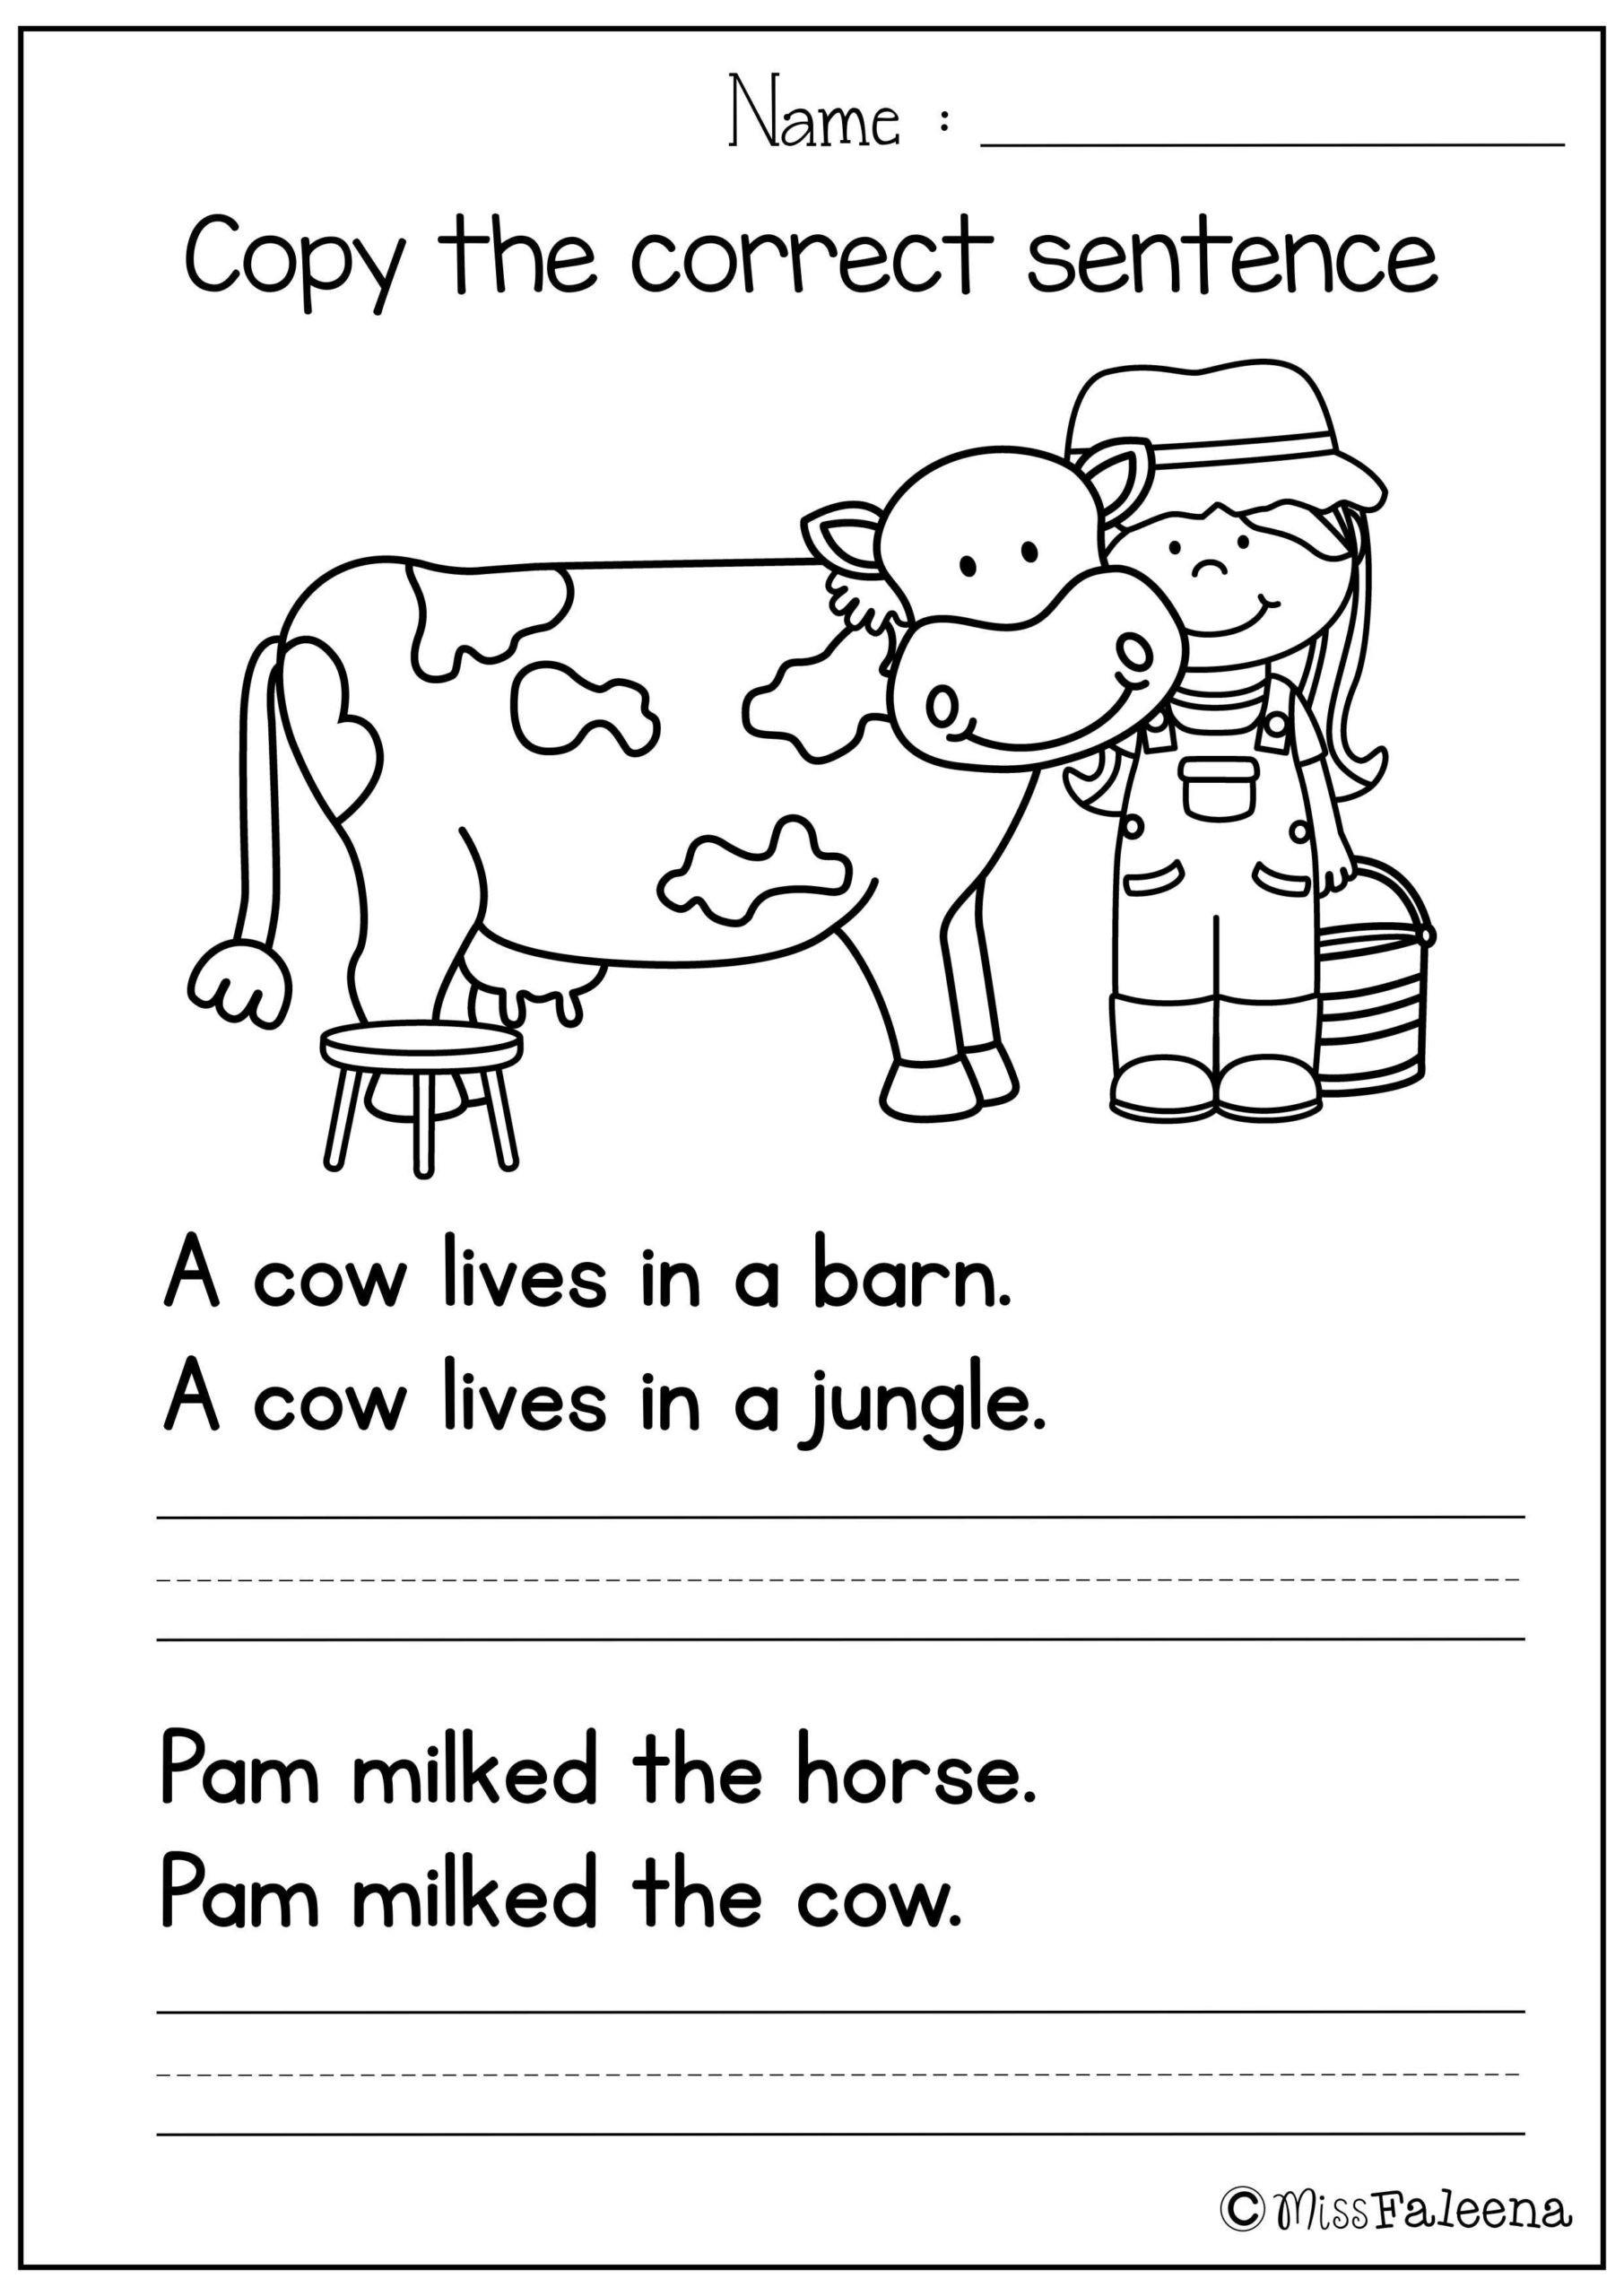 Free Printable Sentence Writing Worksheets Worksheet Gifts for Kindergarten Graduation Ideas Spelling